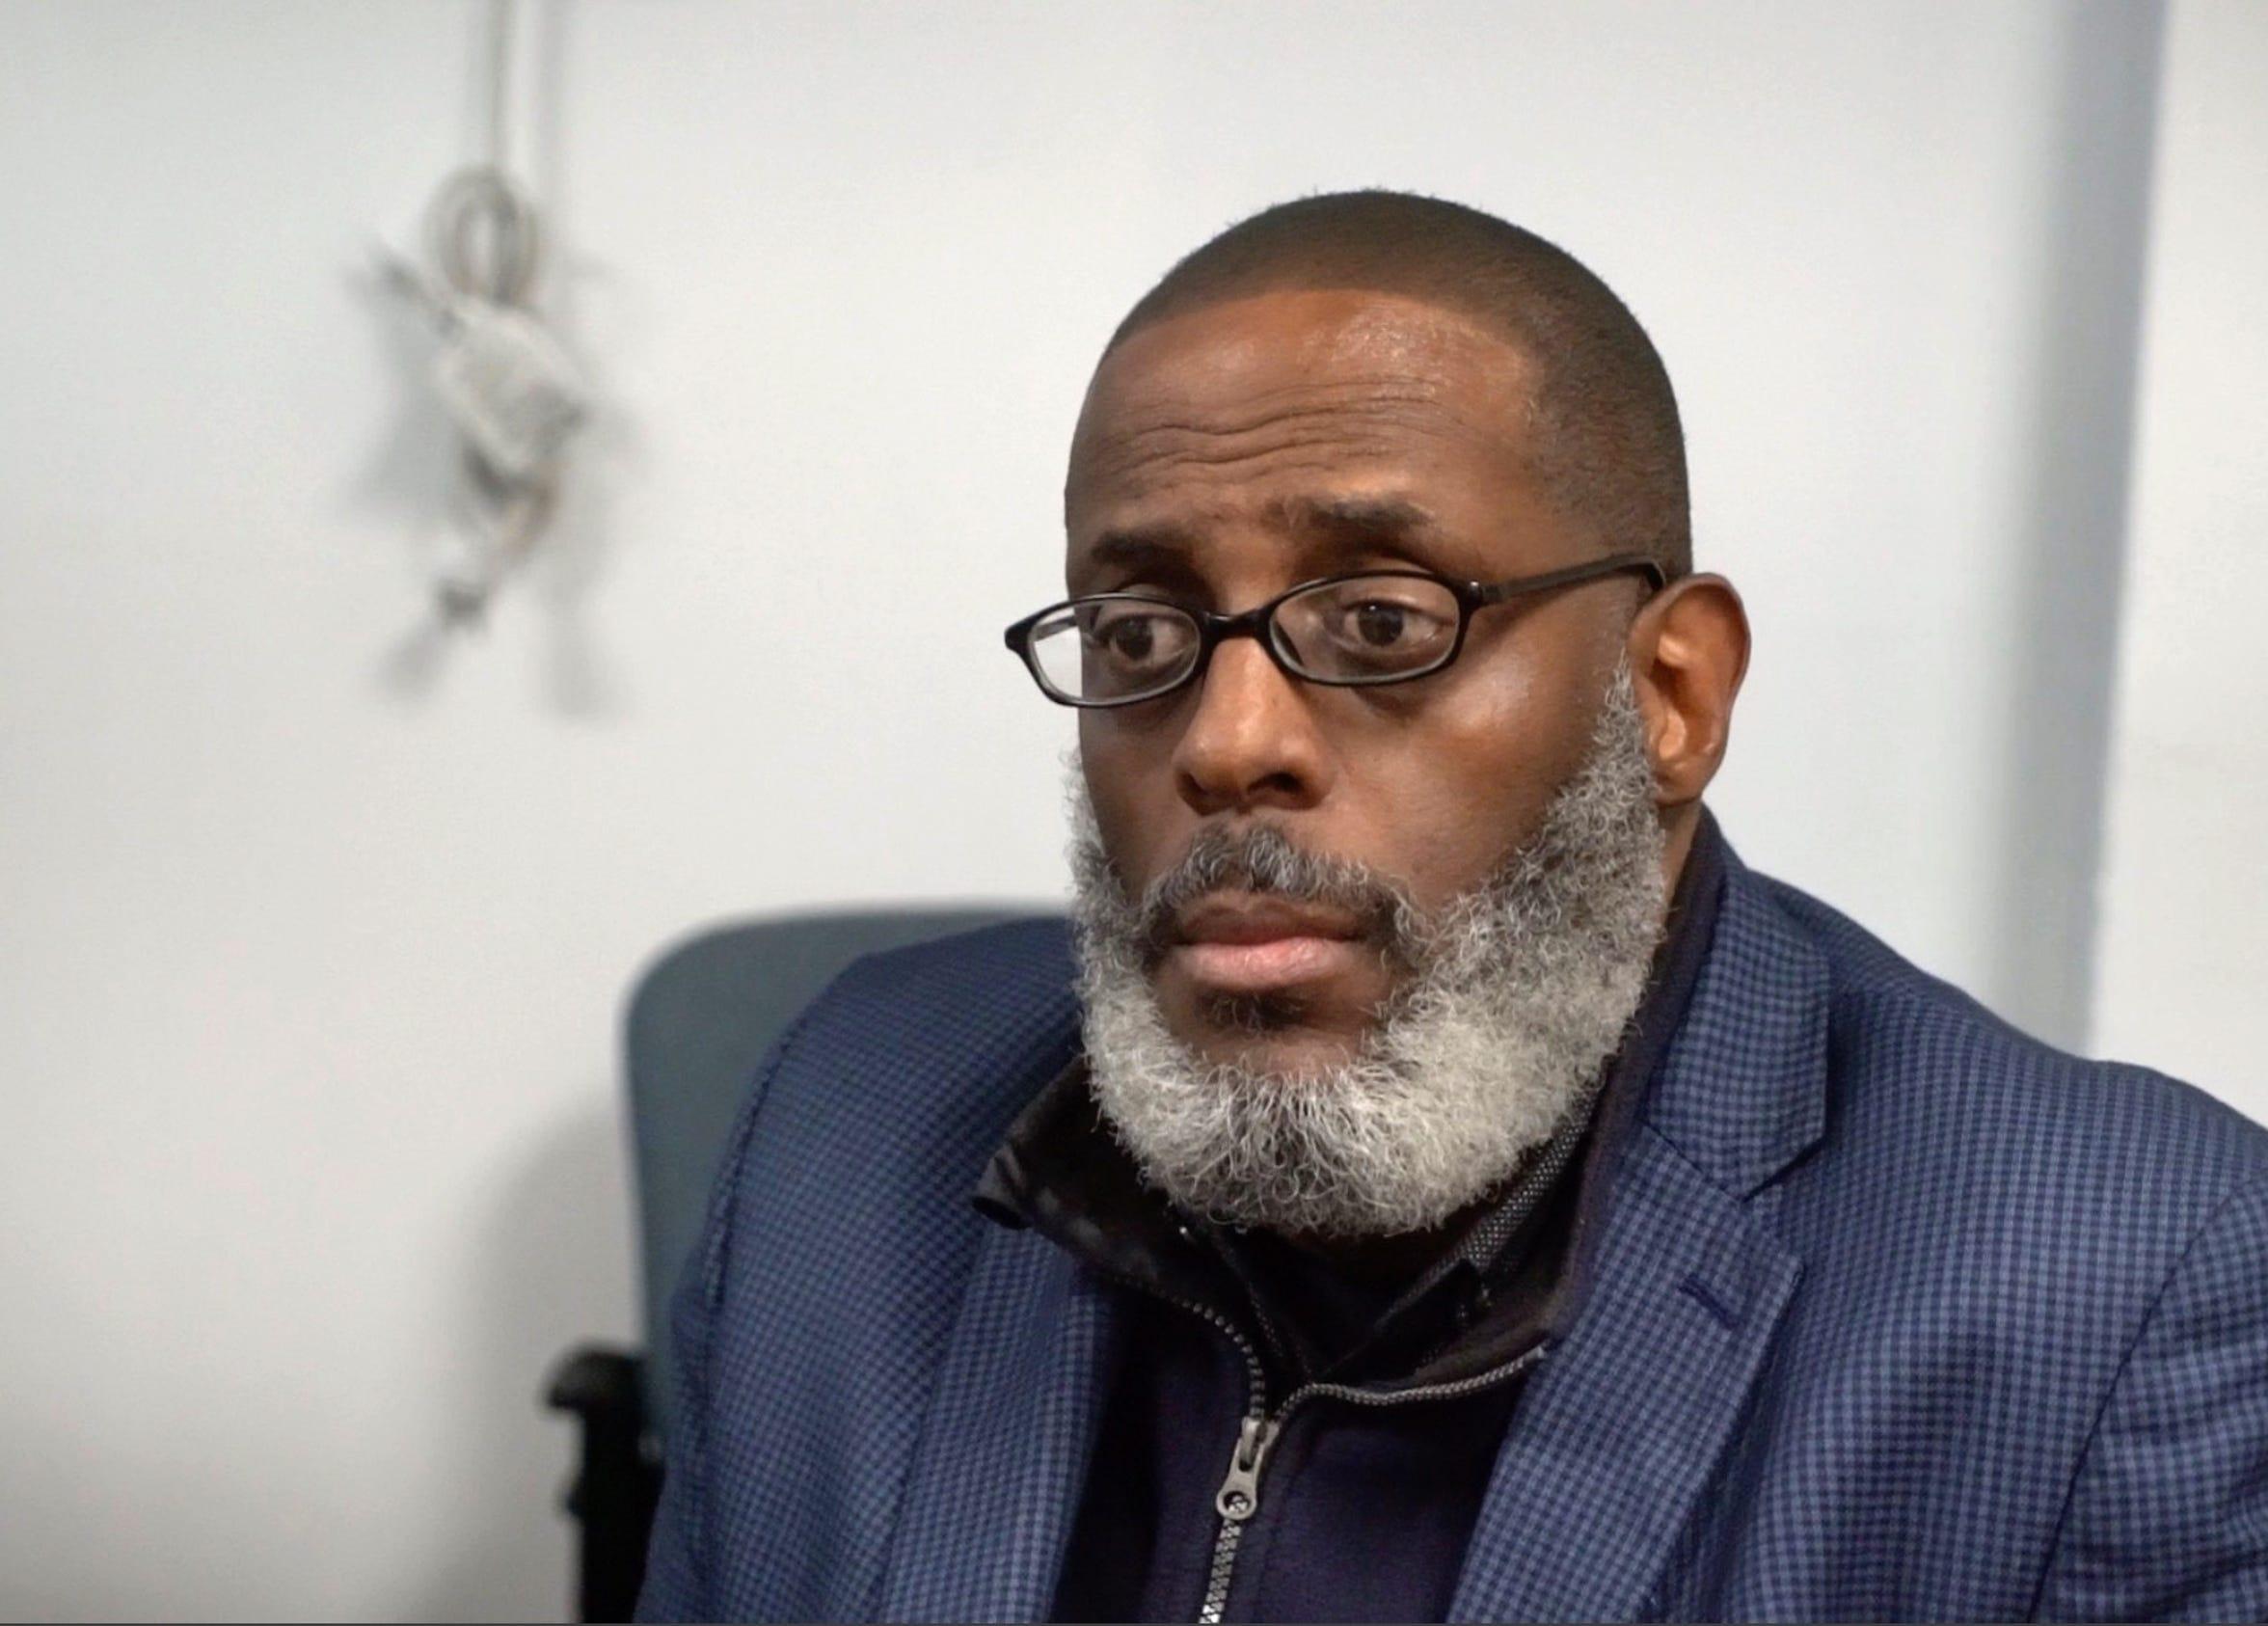 Allen Jones, board chairman of SafeSpace Delaware